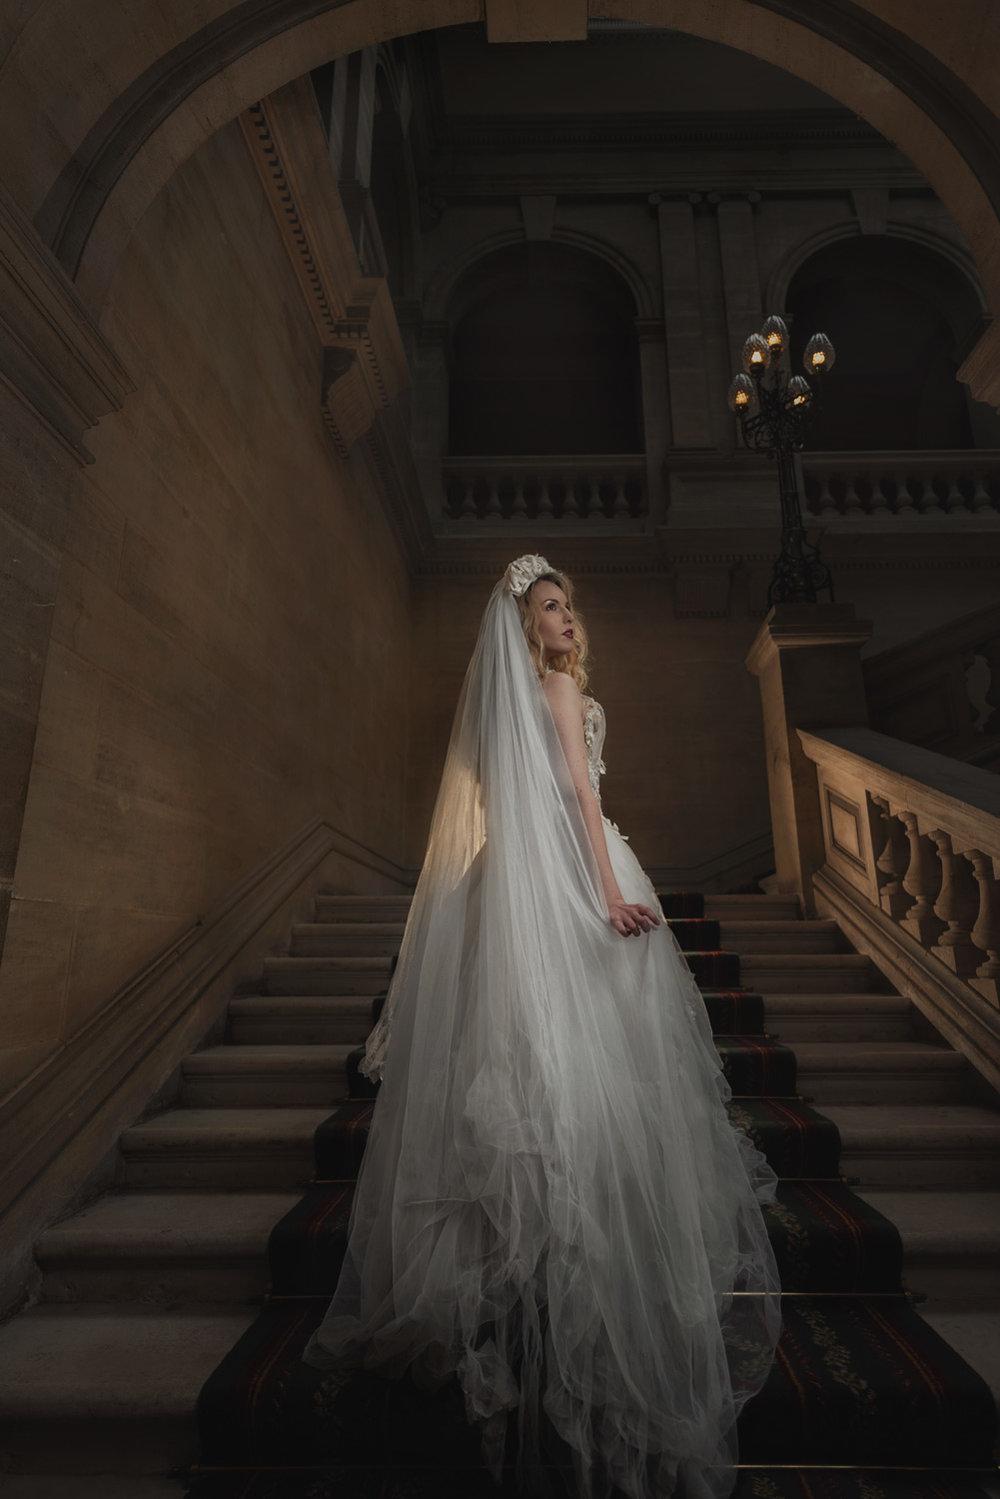 Heythrop Park bridal portrait